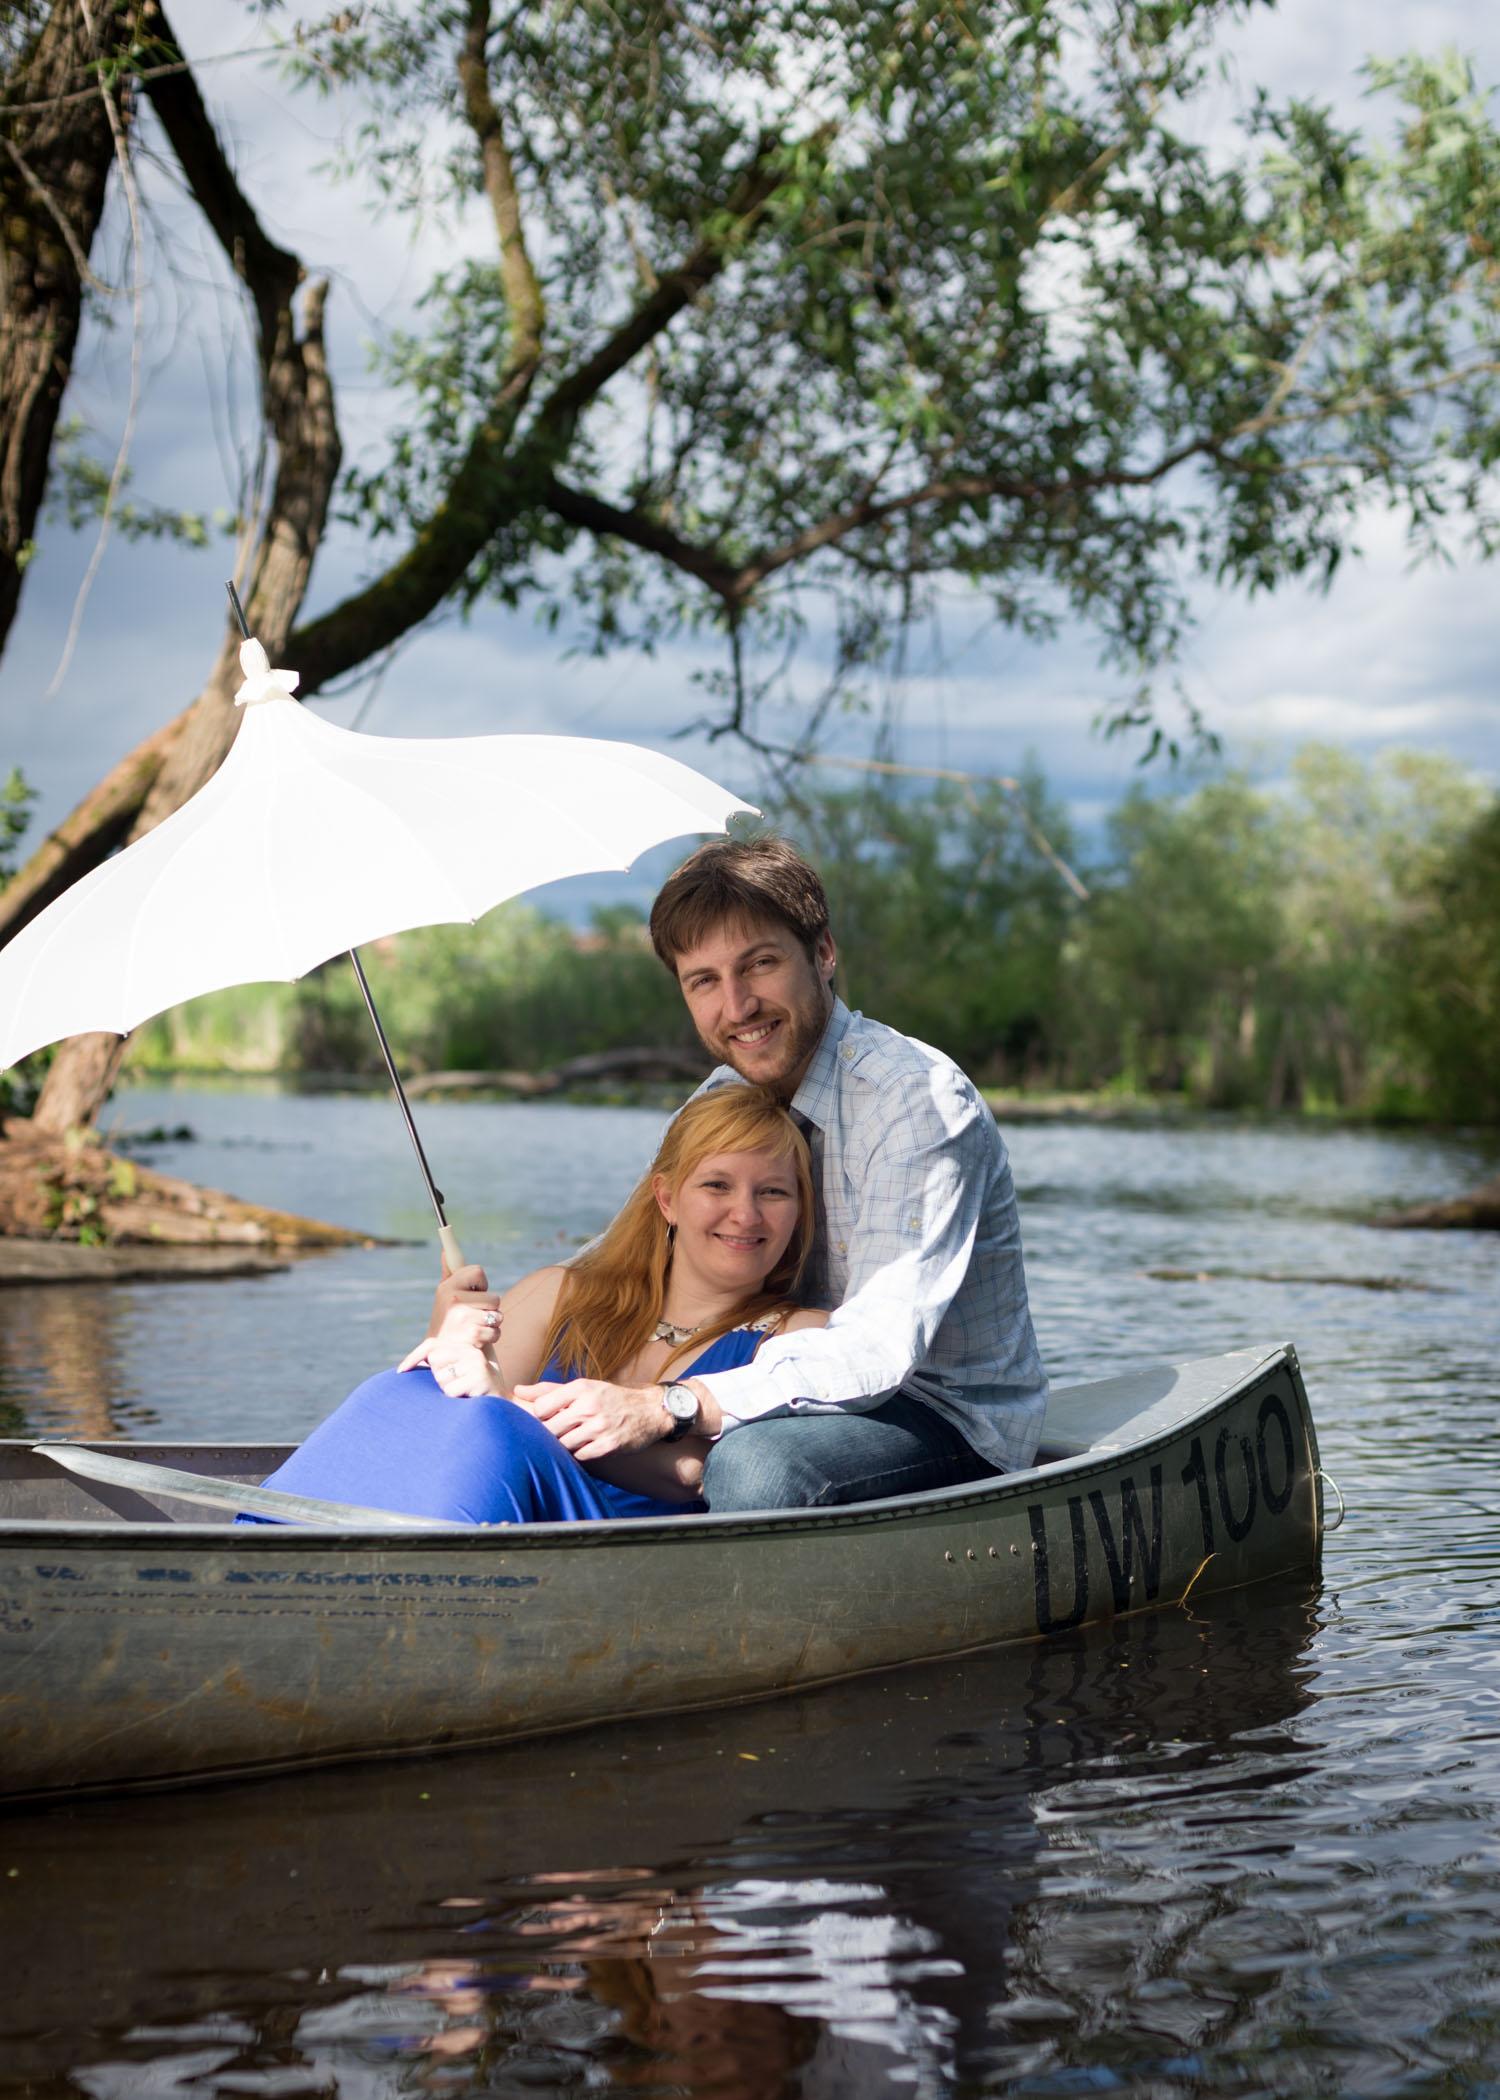 Romantic canoeing in Lake Washington